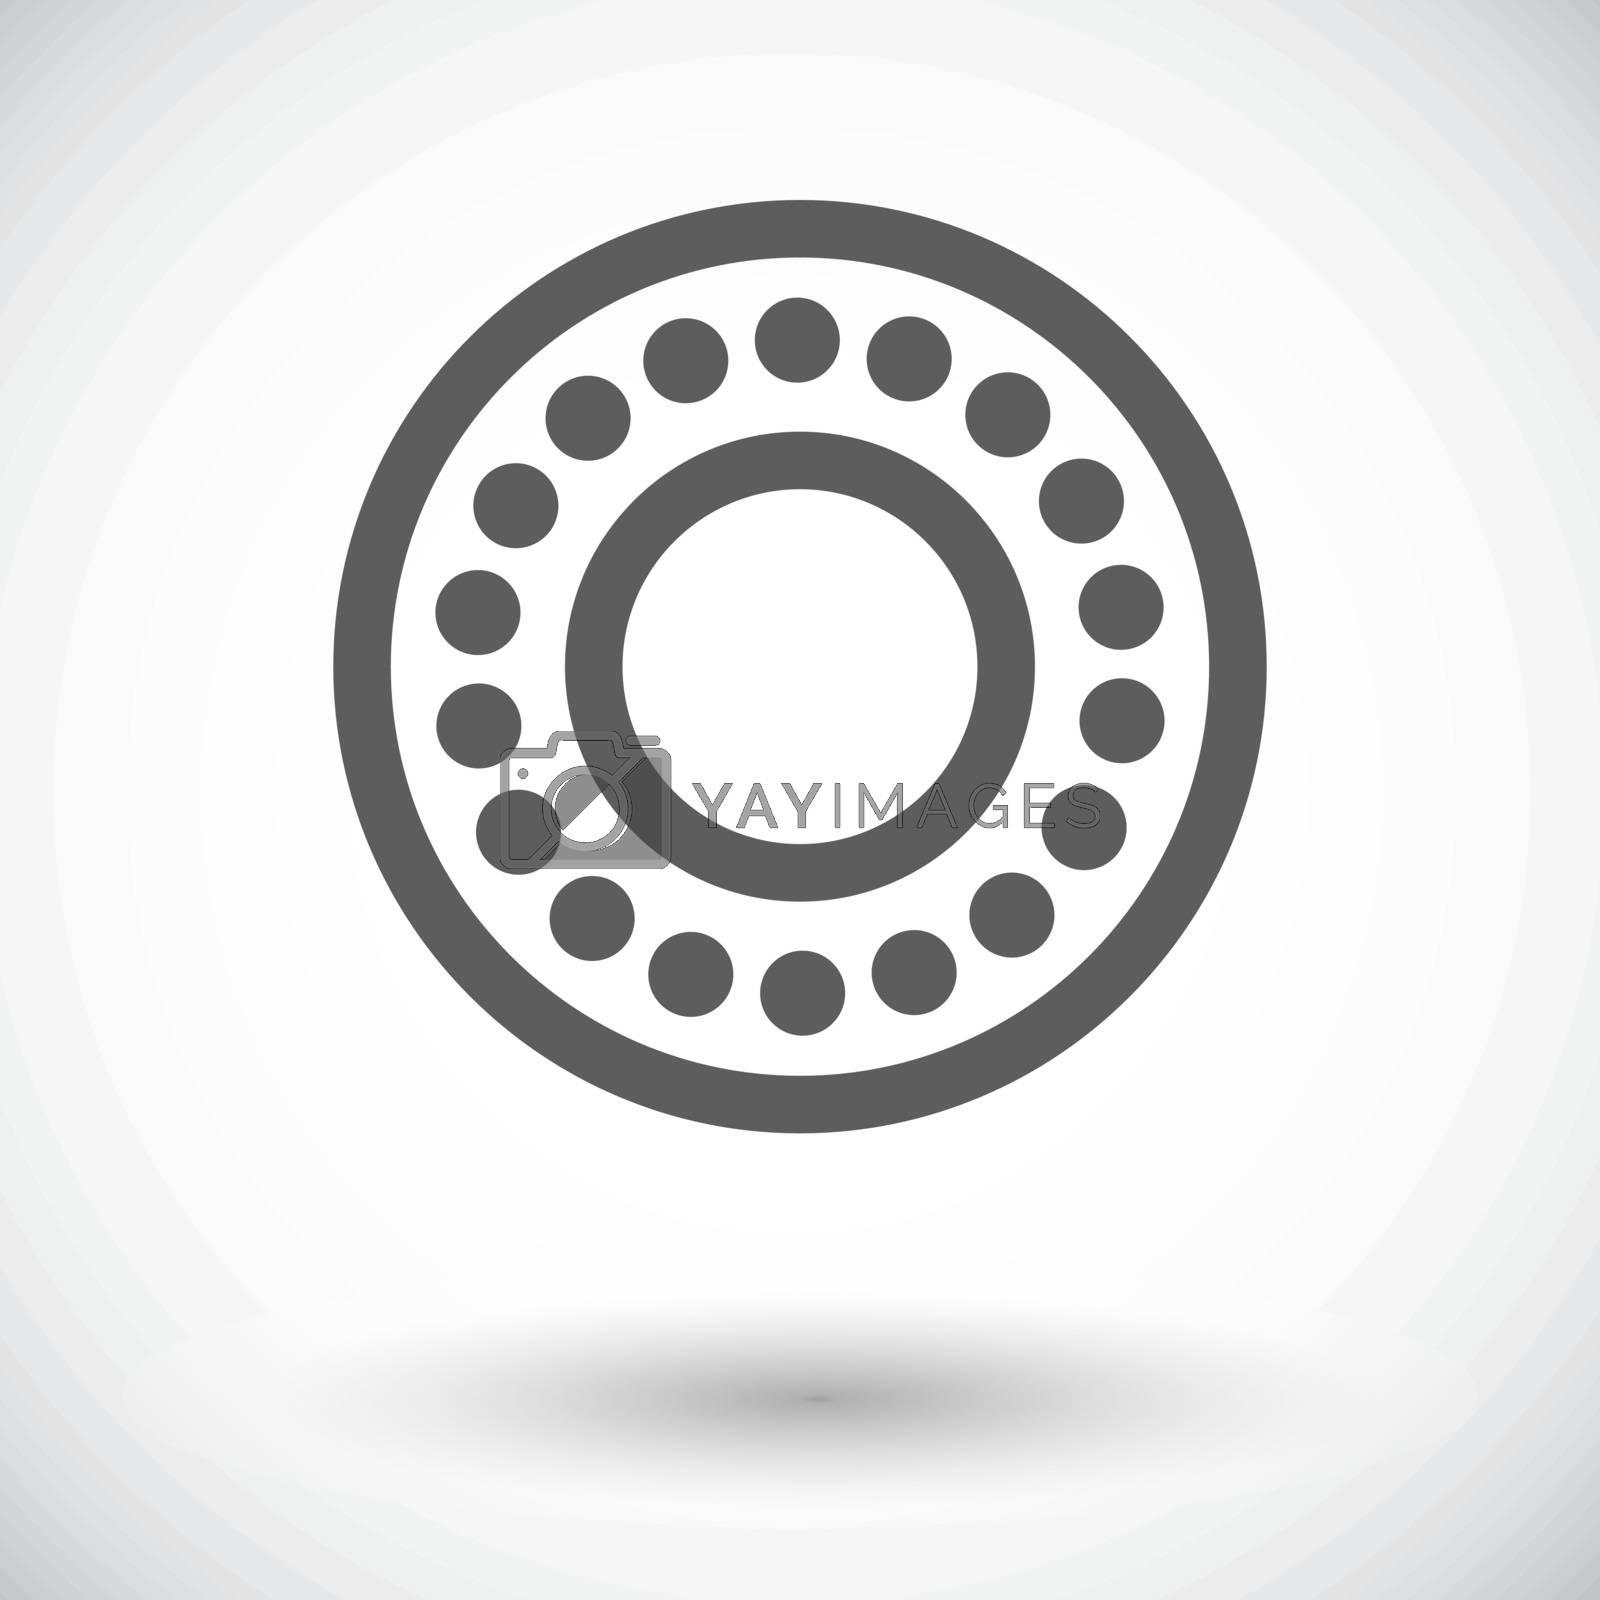 Bearing. Single flat icon on white background. Vector illustration.